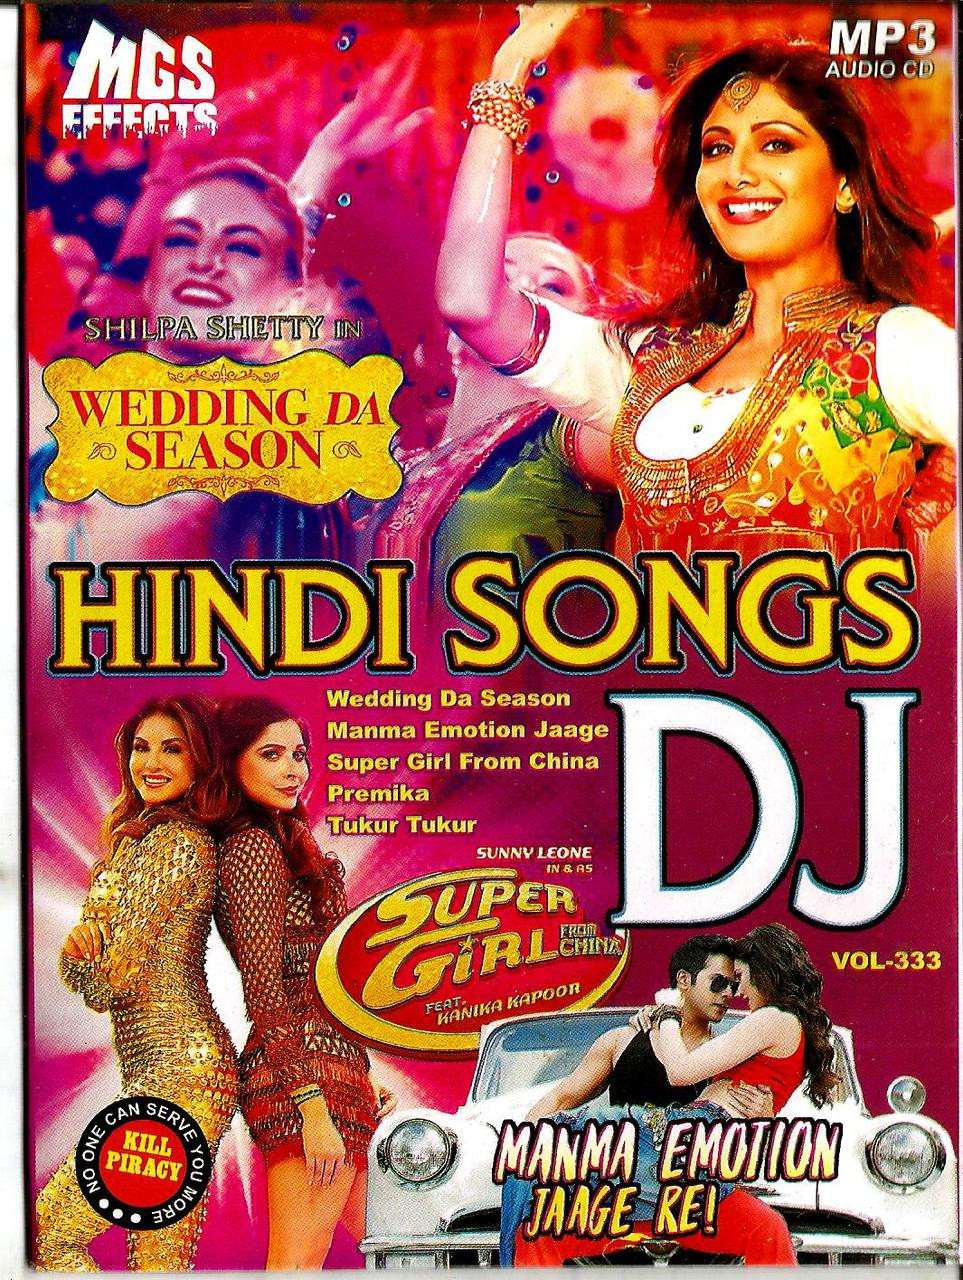 Wedding Da Season Hindi Songs DJ MP 3